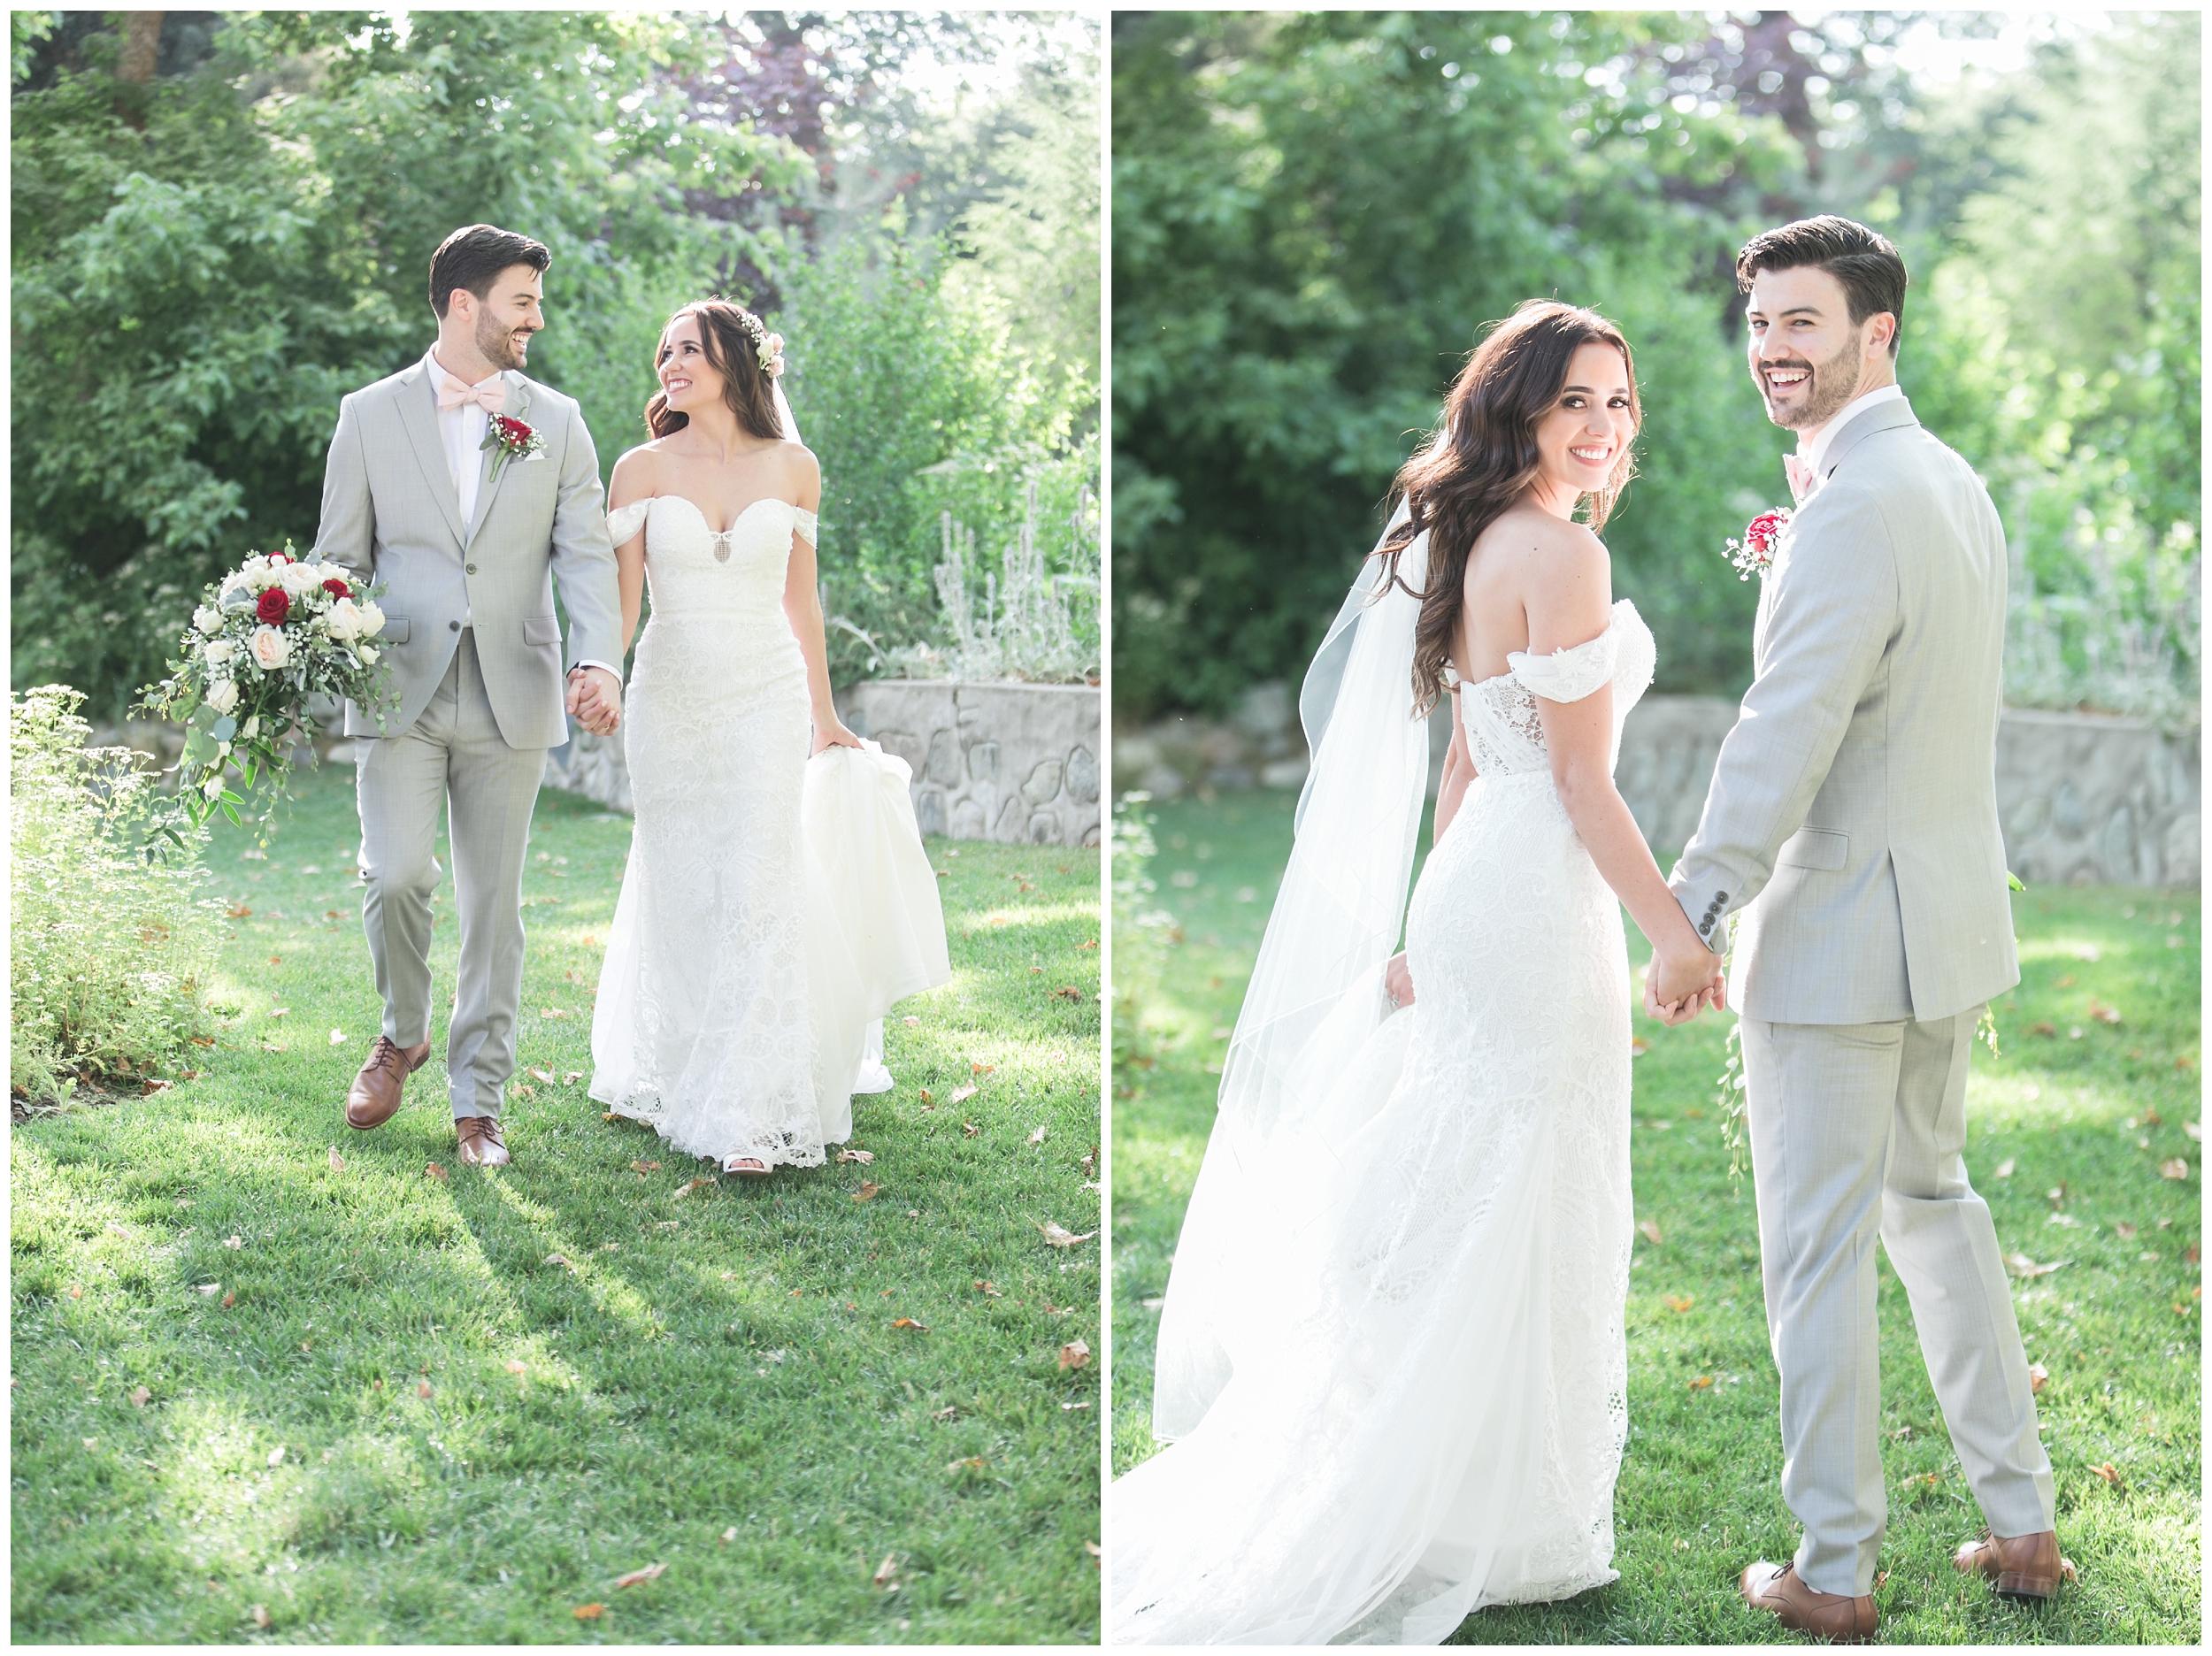 Copy of elegant homestead wilshire ranch wedding bride groom holding hands portrait carrie vines